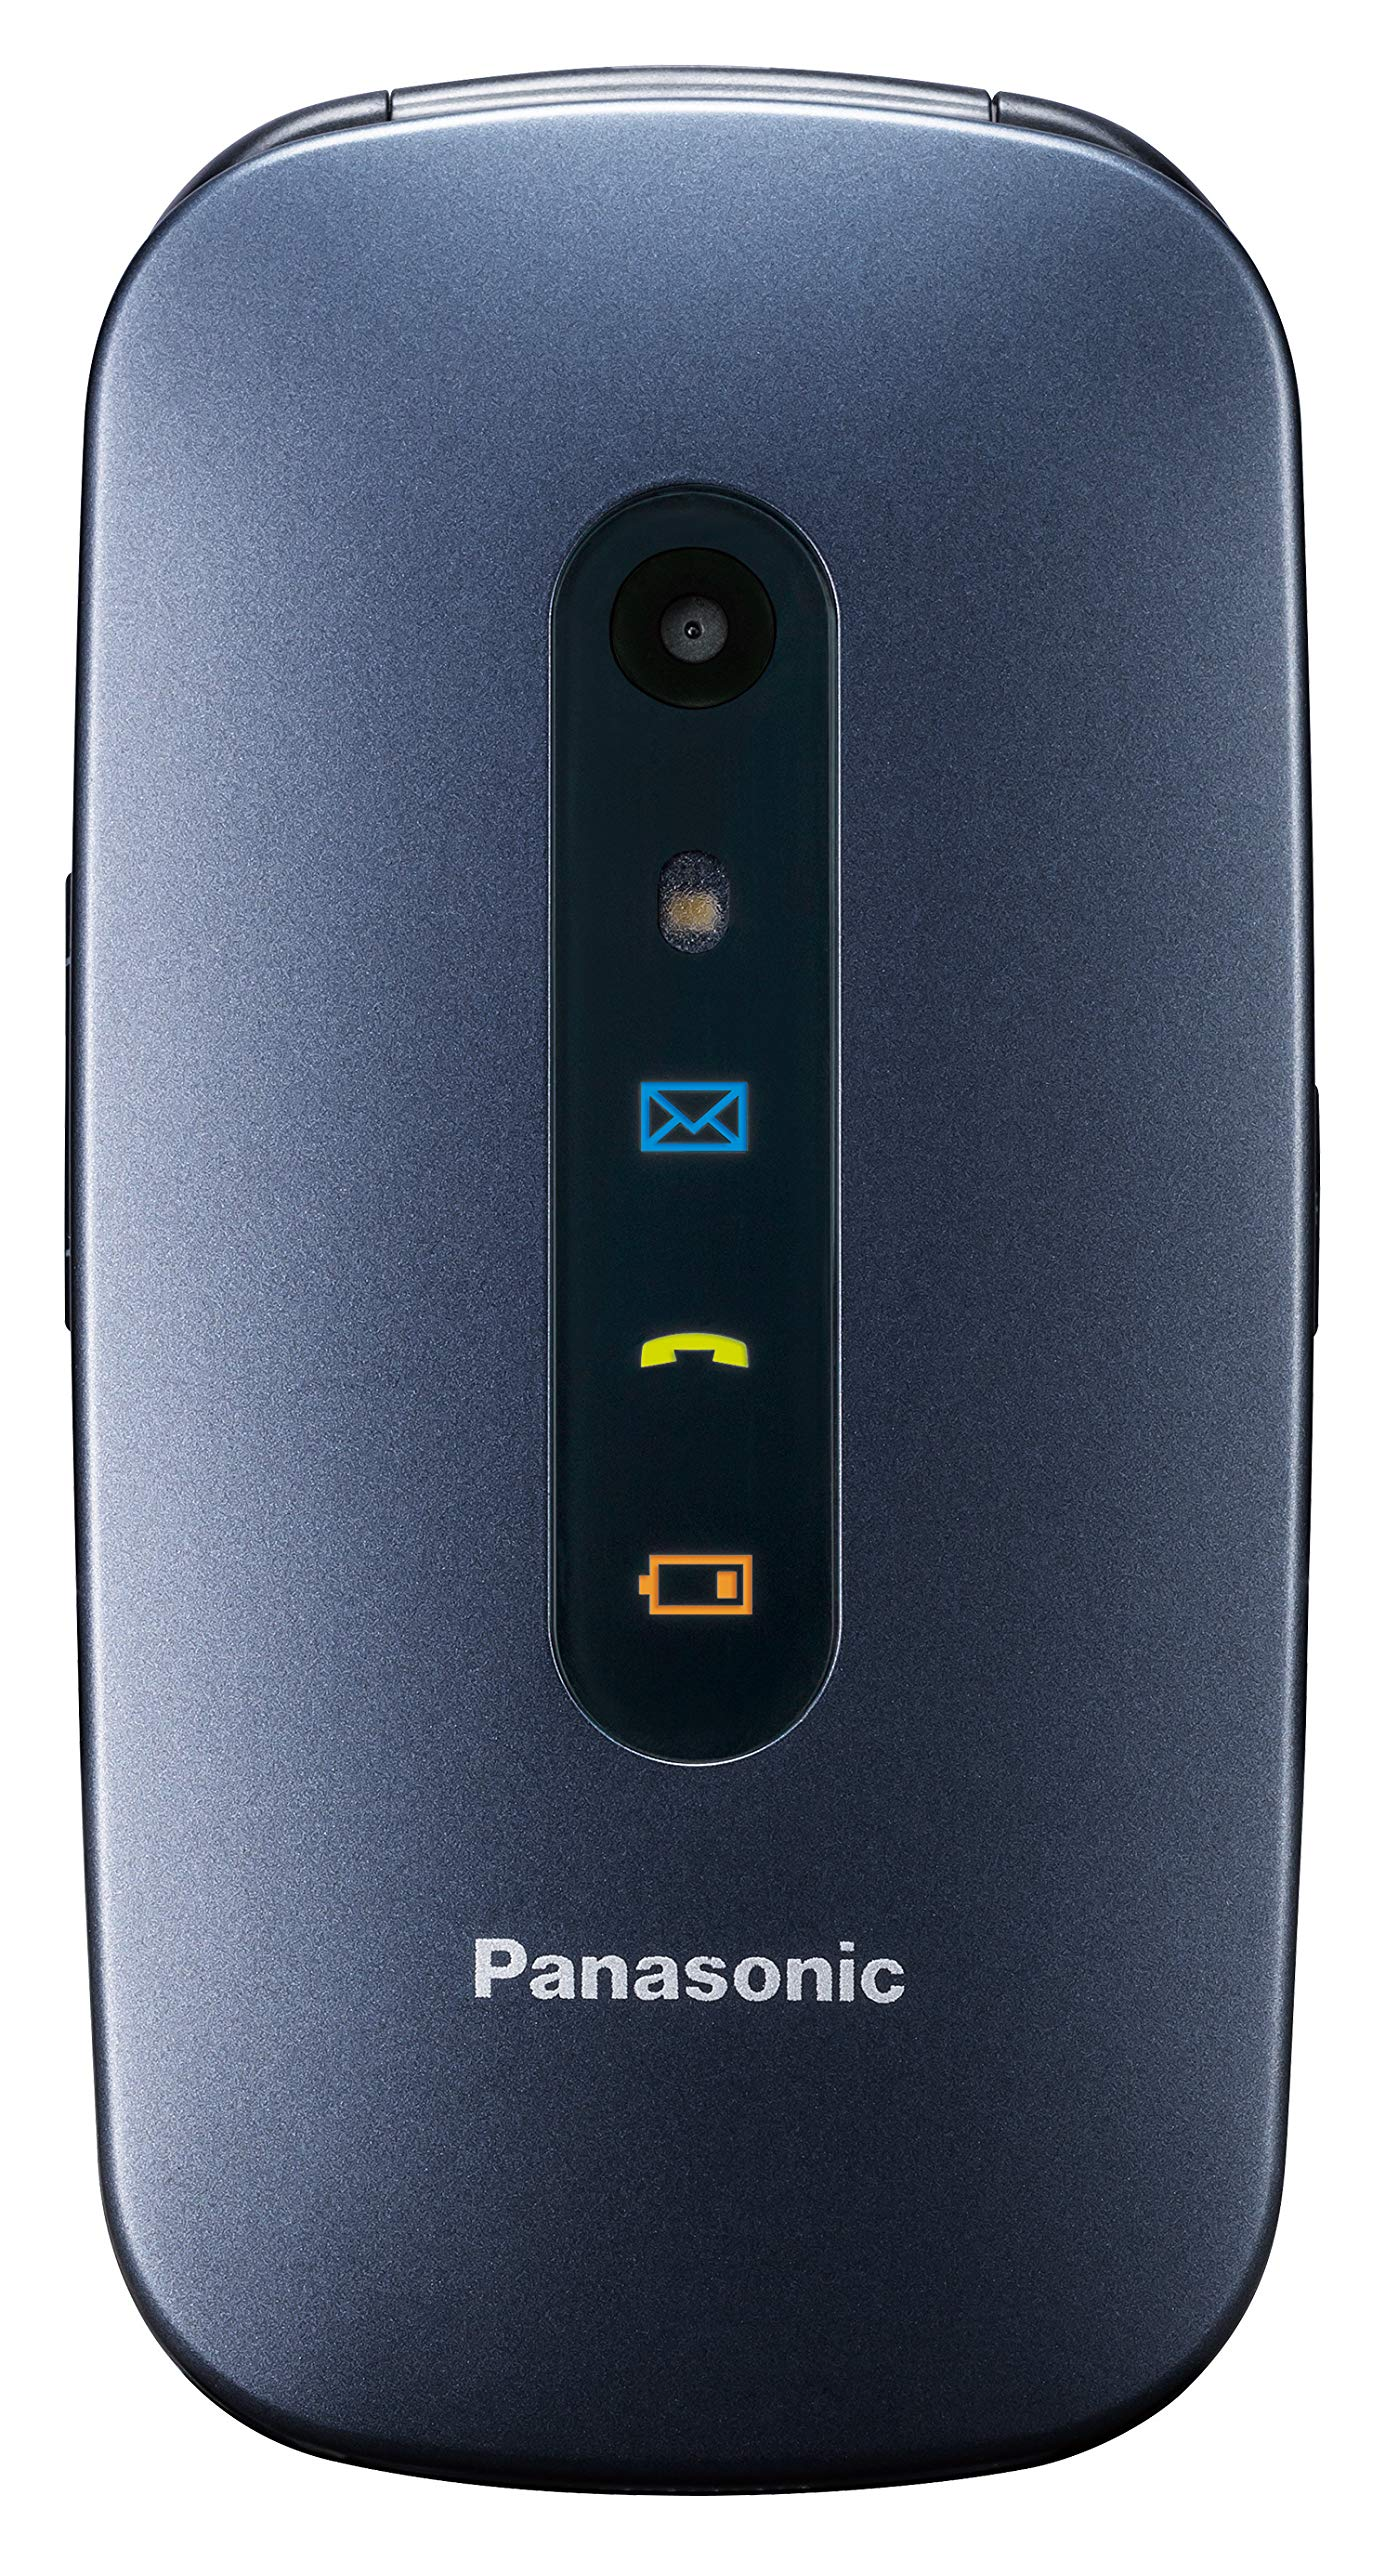 Panasonic KXTU456, Teléfono Móvil para Mayores (Pantalla Color TFT ...